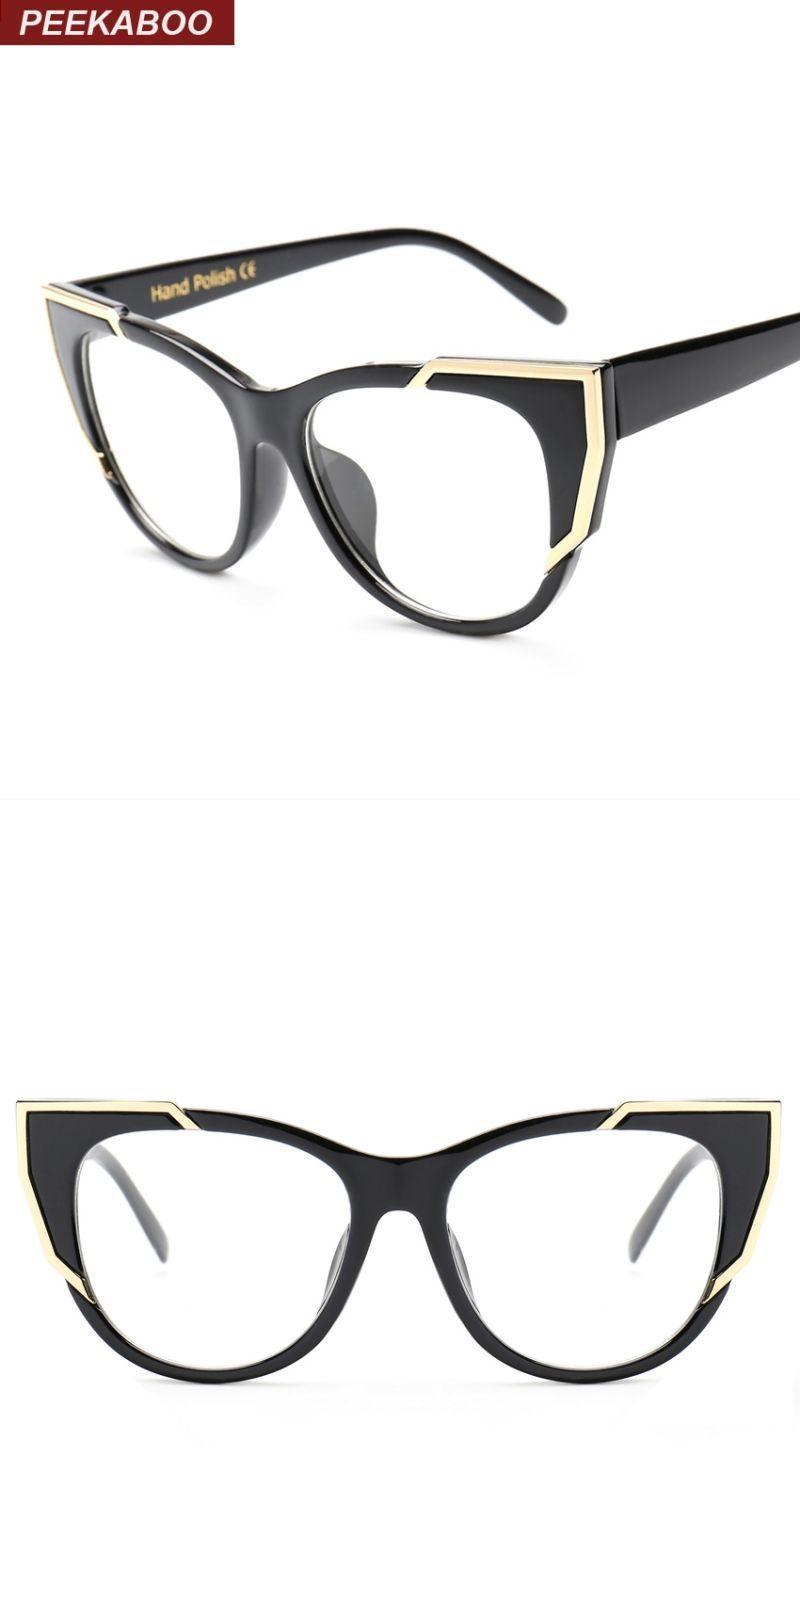 463311f8fb2b Brand designer eye glasses frames for women cat eye clear lens fashion sexy  vintage spectacle frames female uv lunette  eyewear  accessories  frames   solid ...